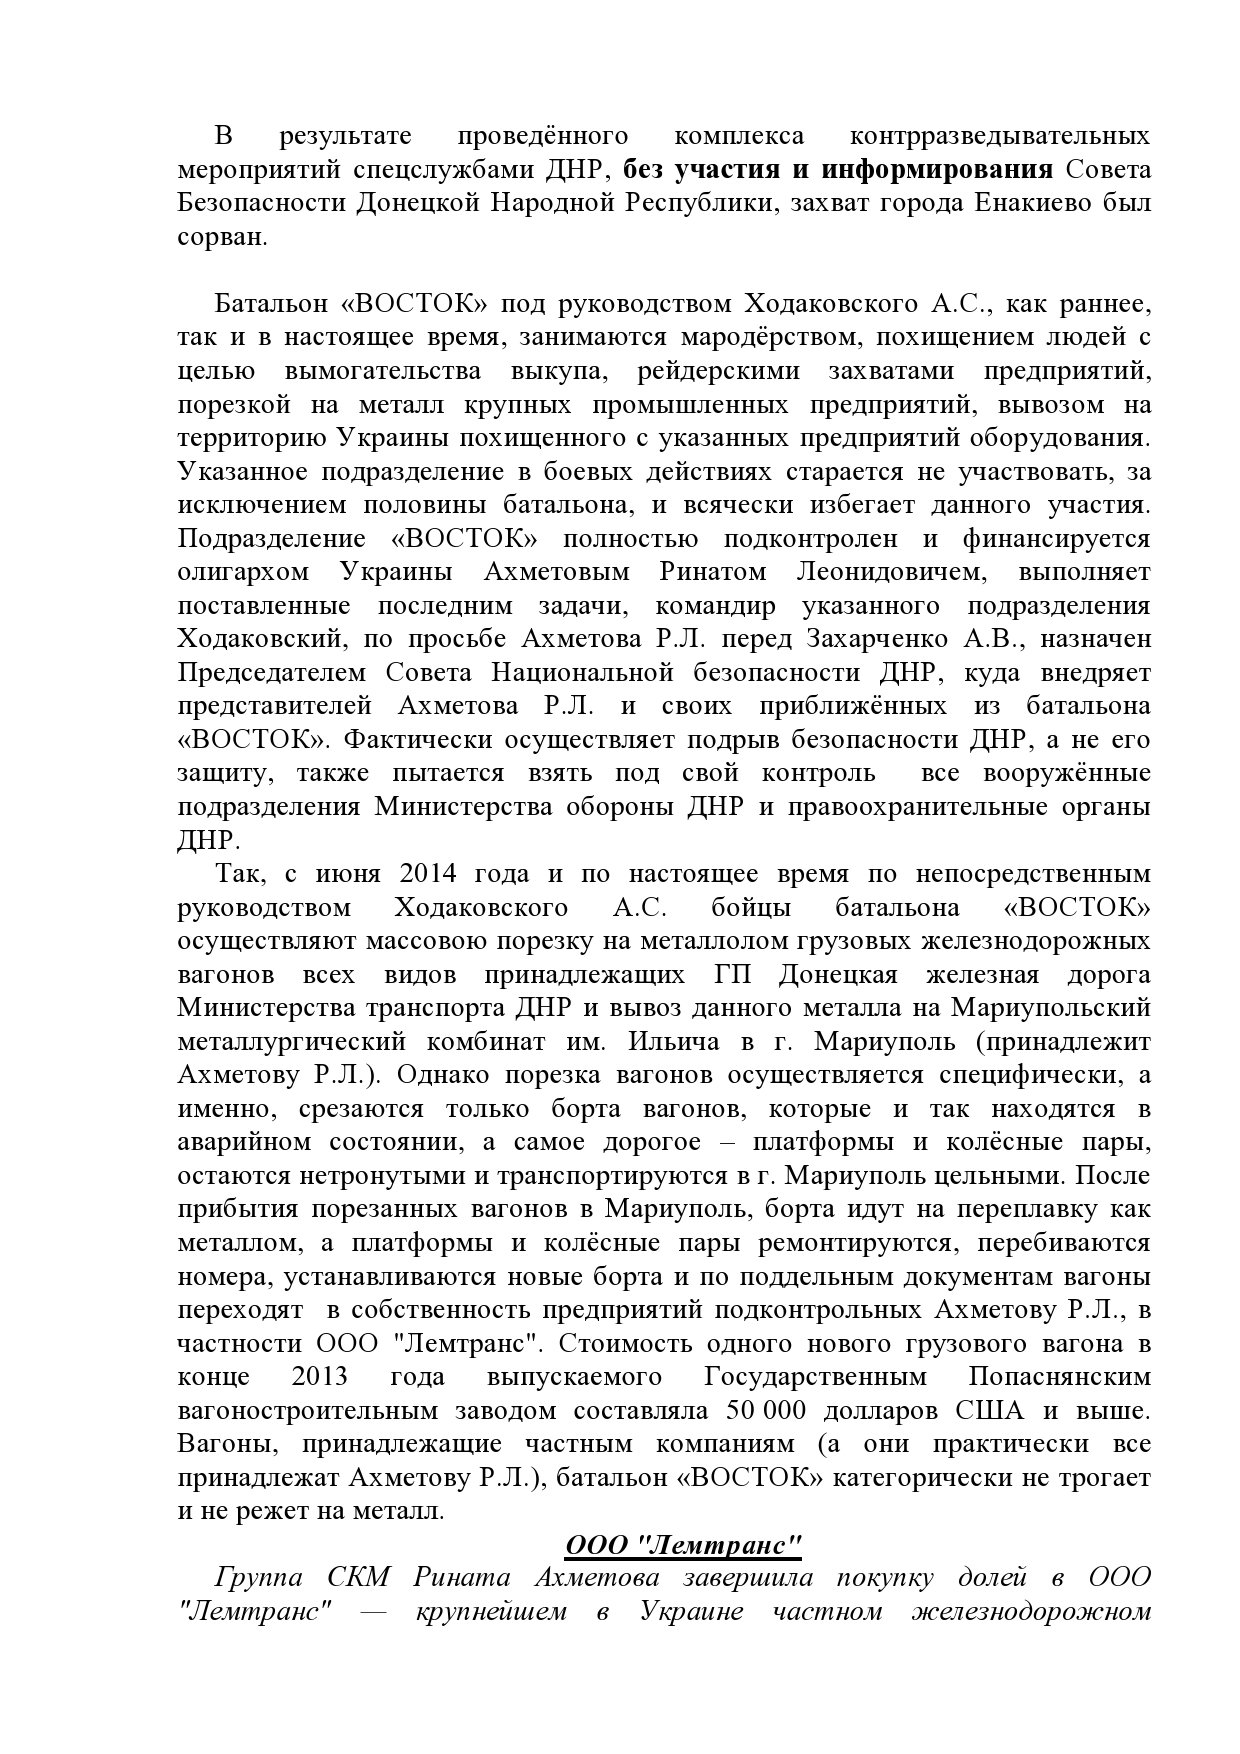 https://b0ltai.files.wordpress.com/2015/09/page0003.jpg